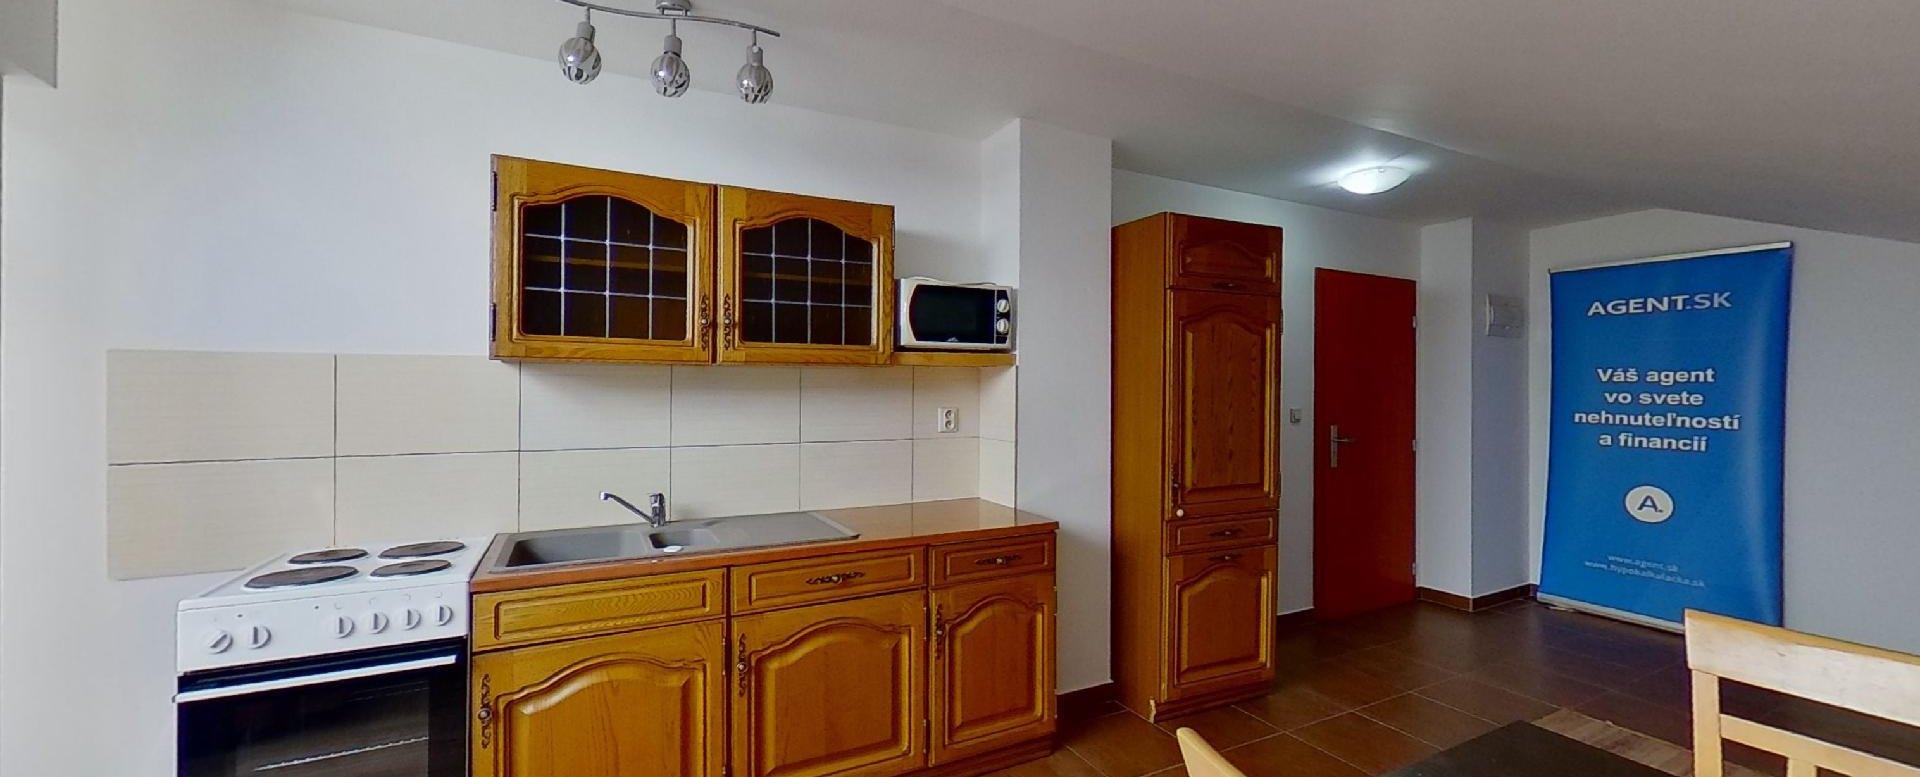 kuchynský kút v obývacej izbe